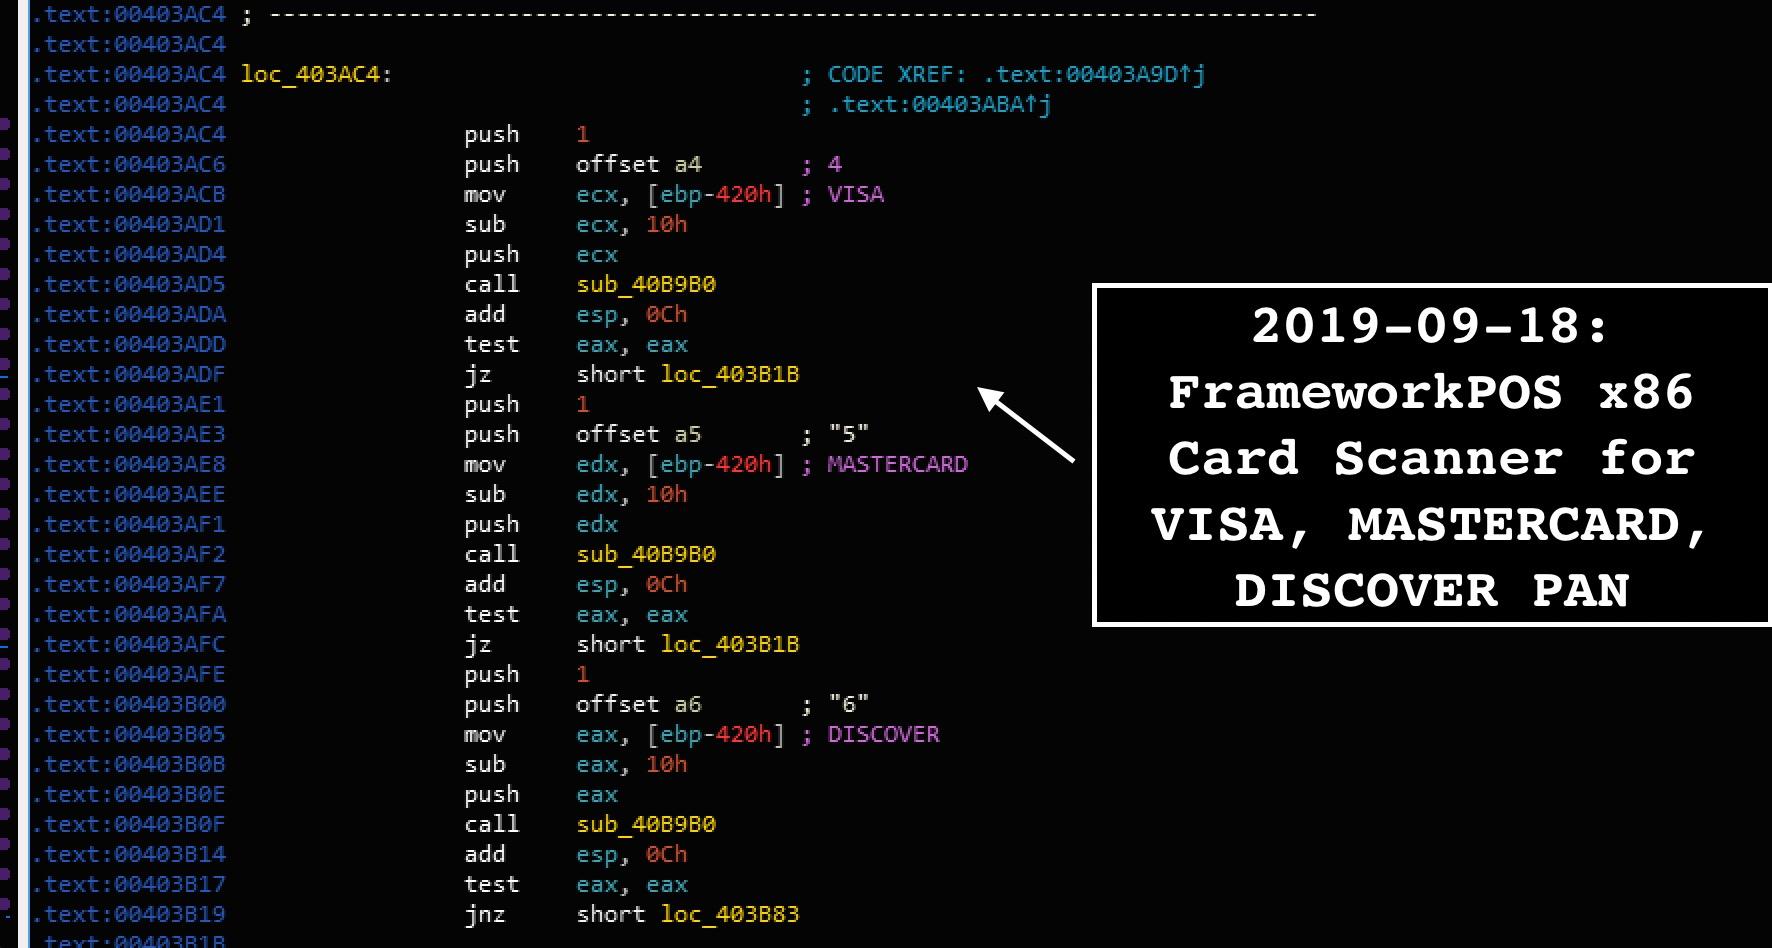 "Fin6 ""Frameworkpos"": Point-Of-Sale Malware Analysis"